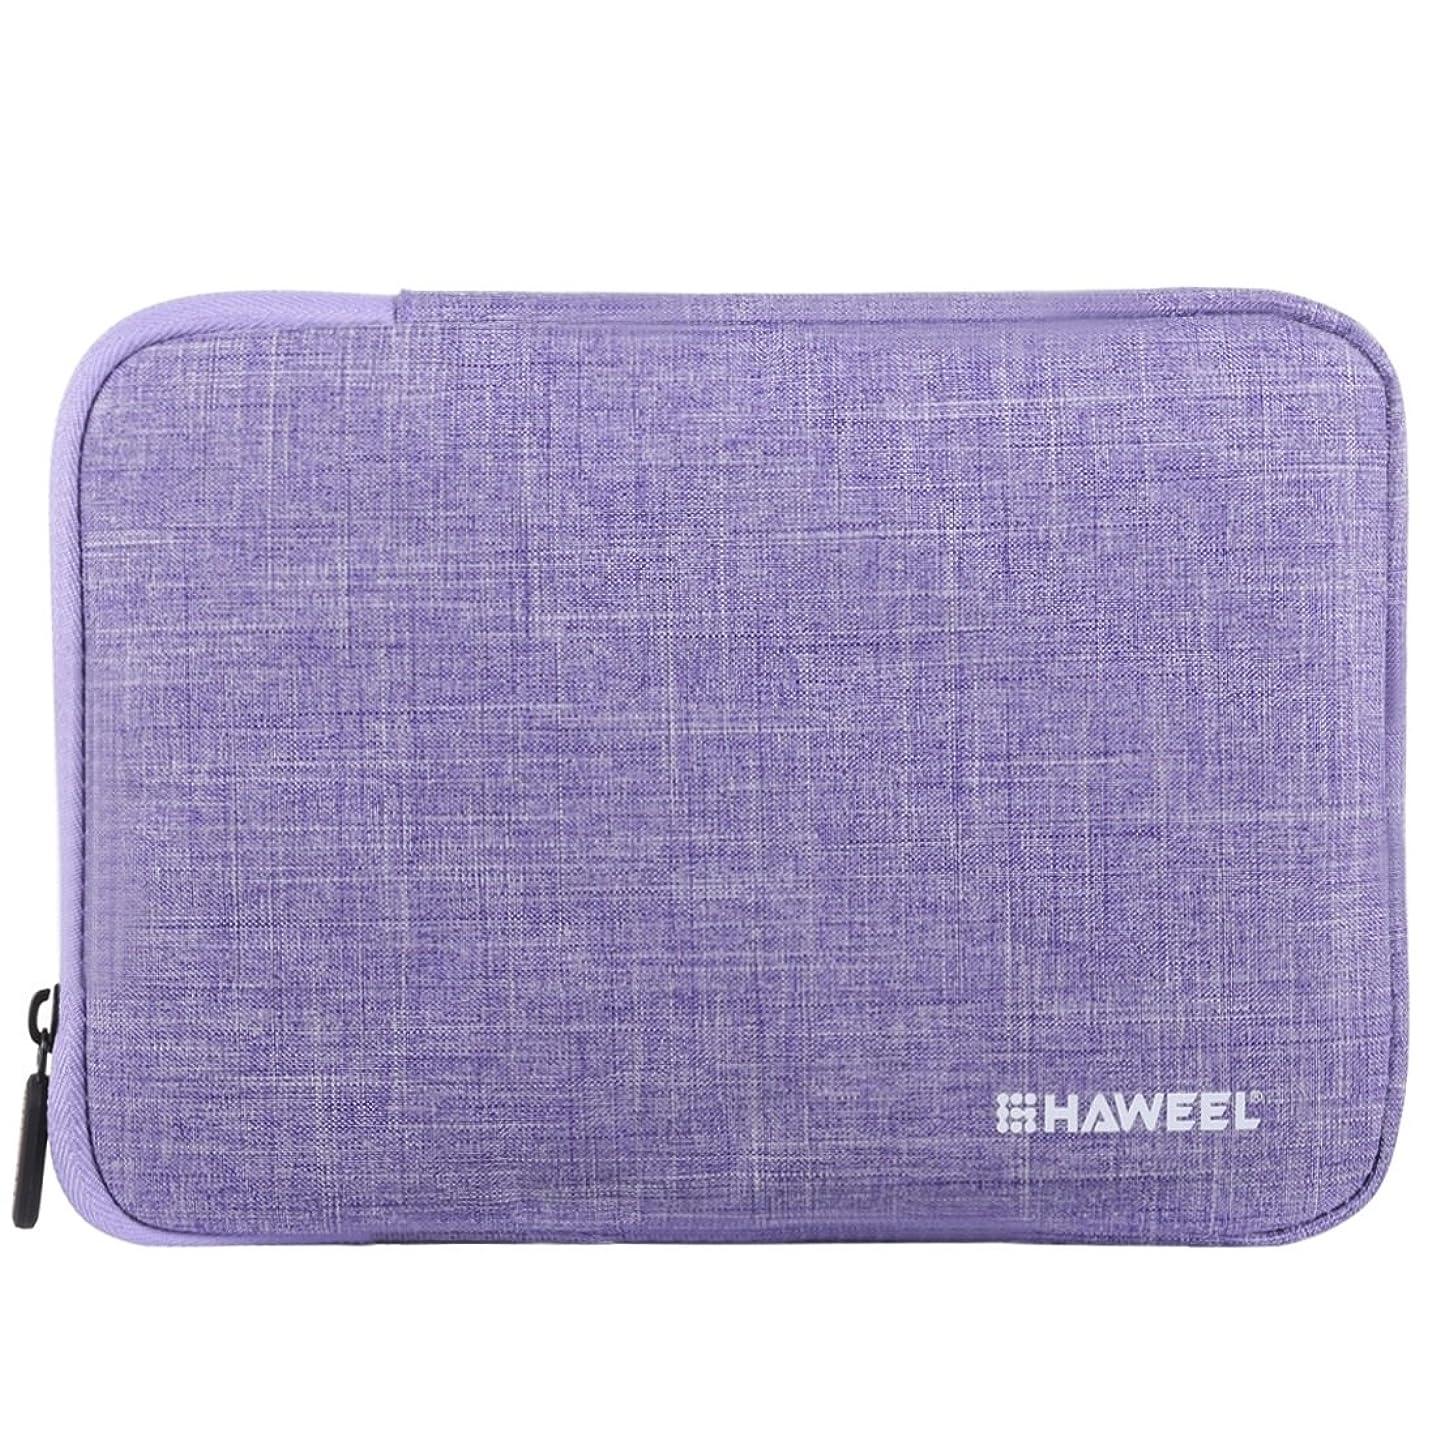 HAWEEL 15 Inch Laptop Sleeve 15-15.6 Inch for MacBook Pro 15.4-inch/Retina Display Case Bag 15